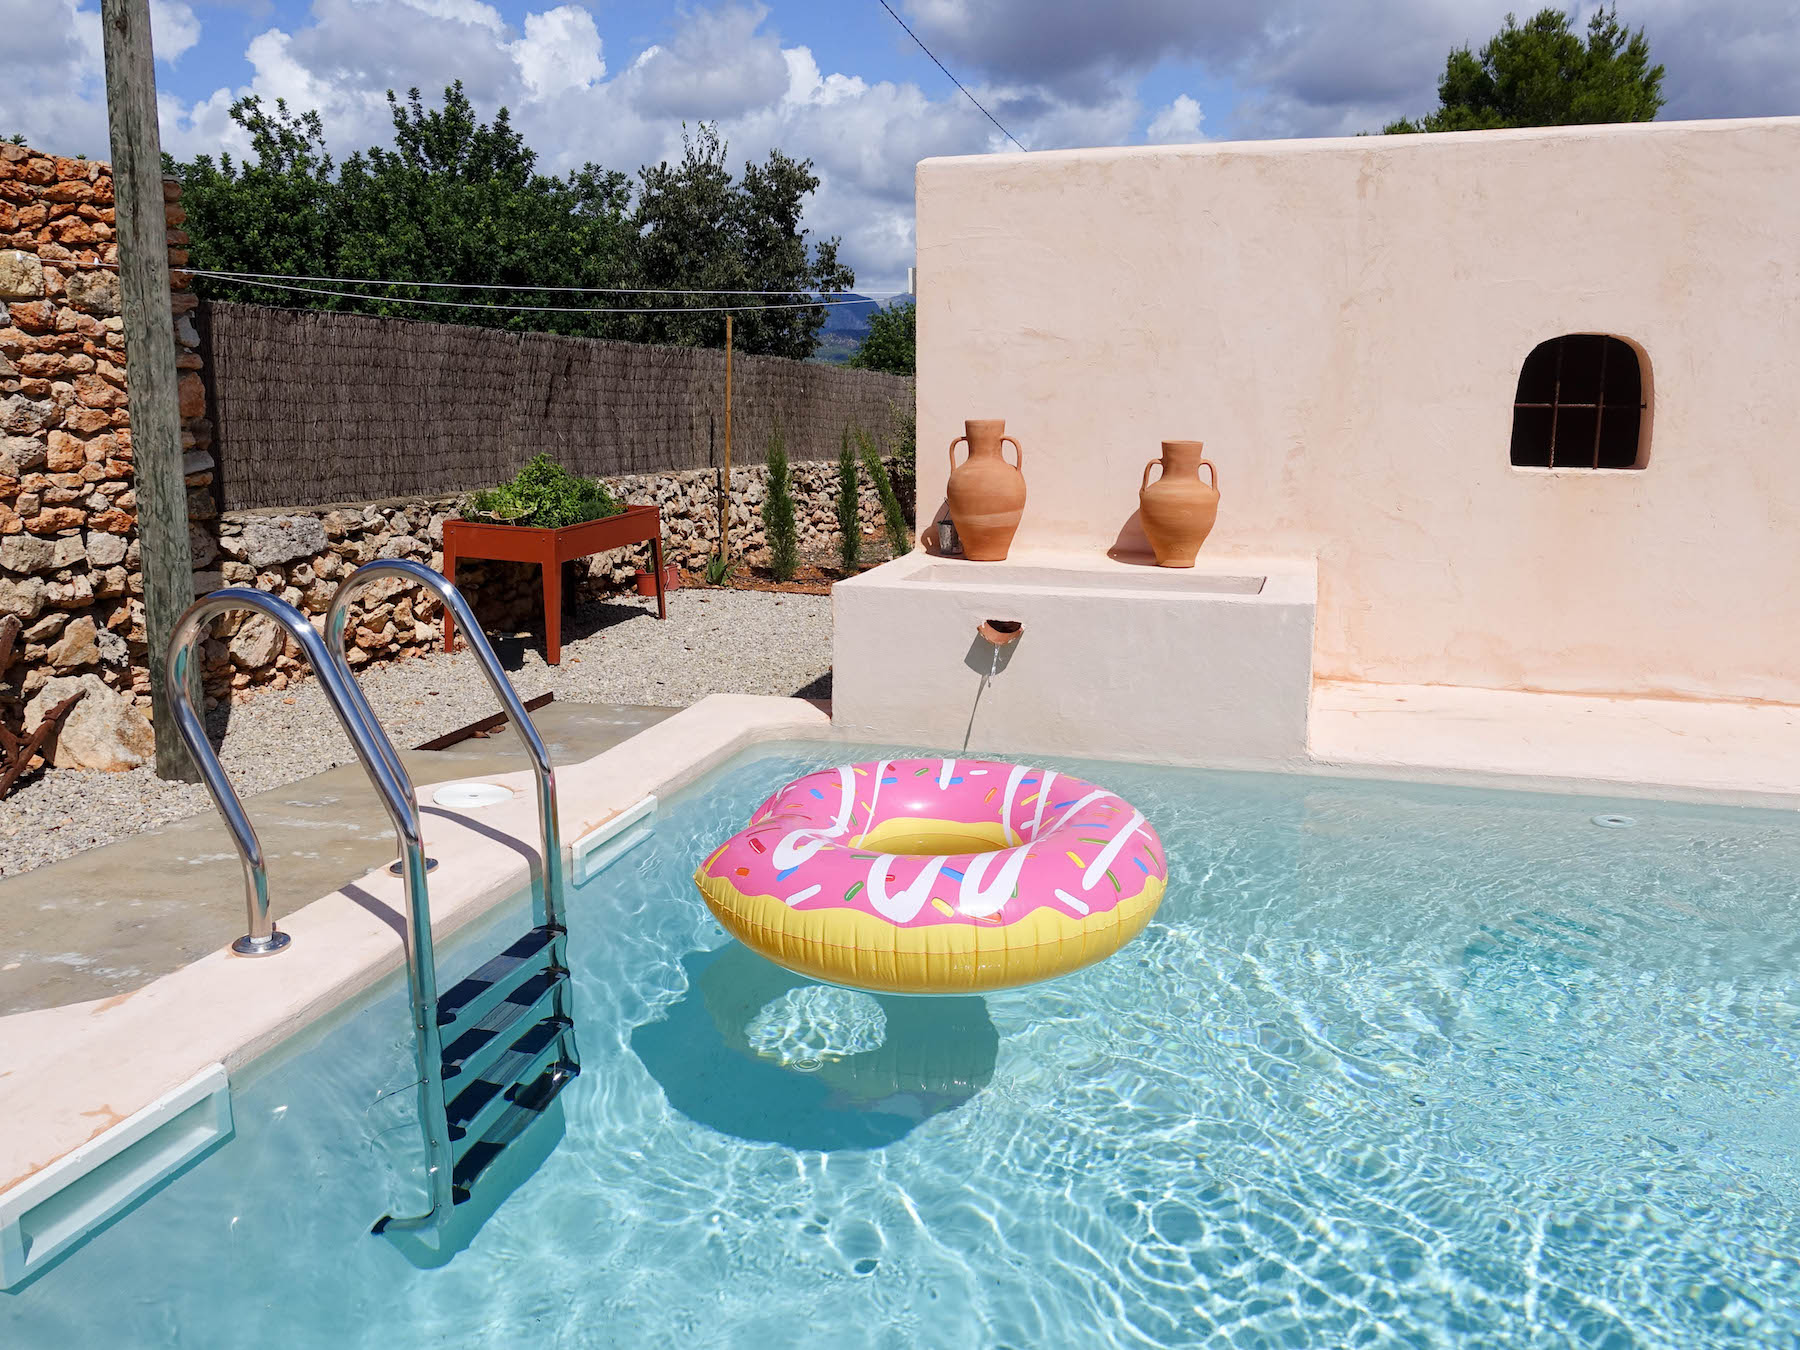 suelovesnyc_susan_fengler_airbnb_finca_mallorca_mieten_pool